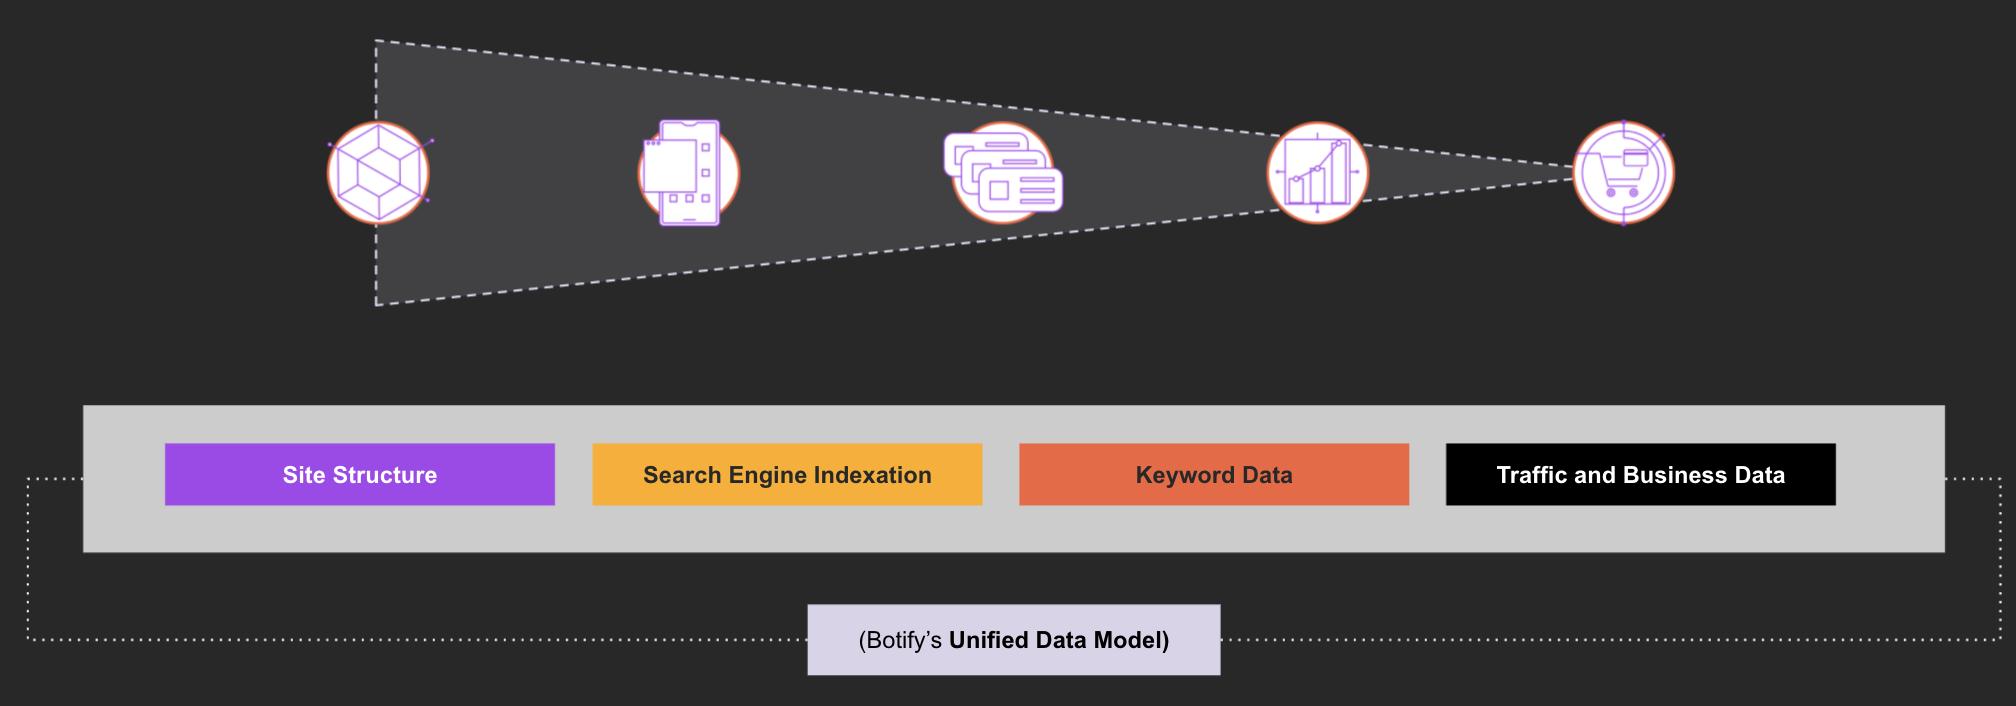 Botify's Unified Data Model